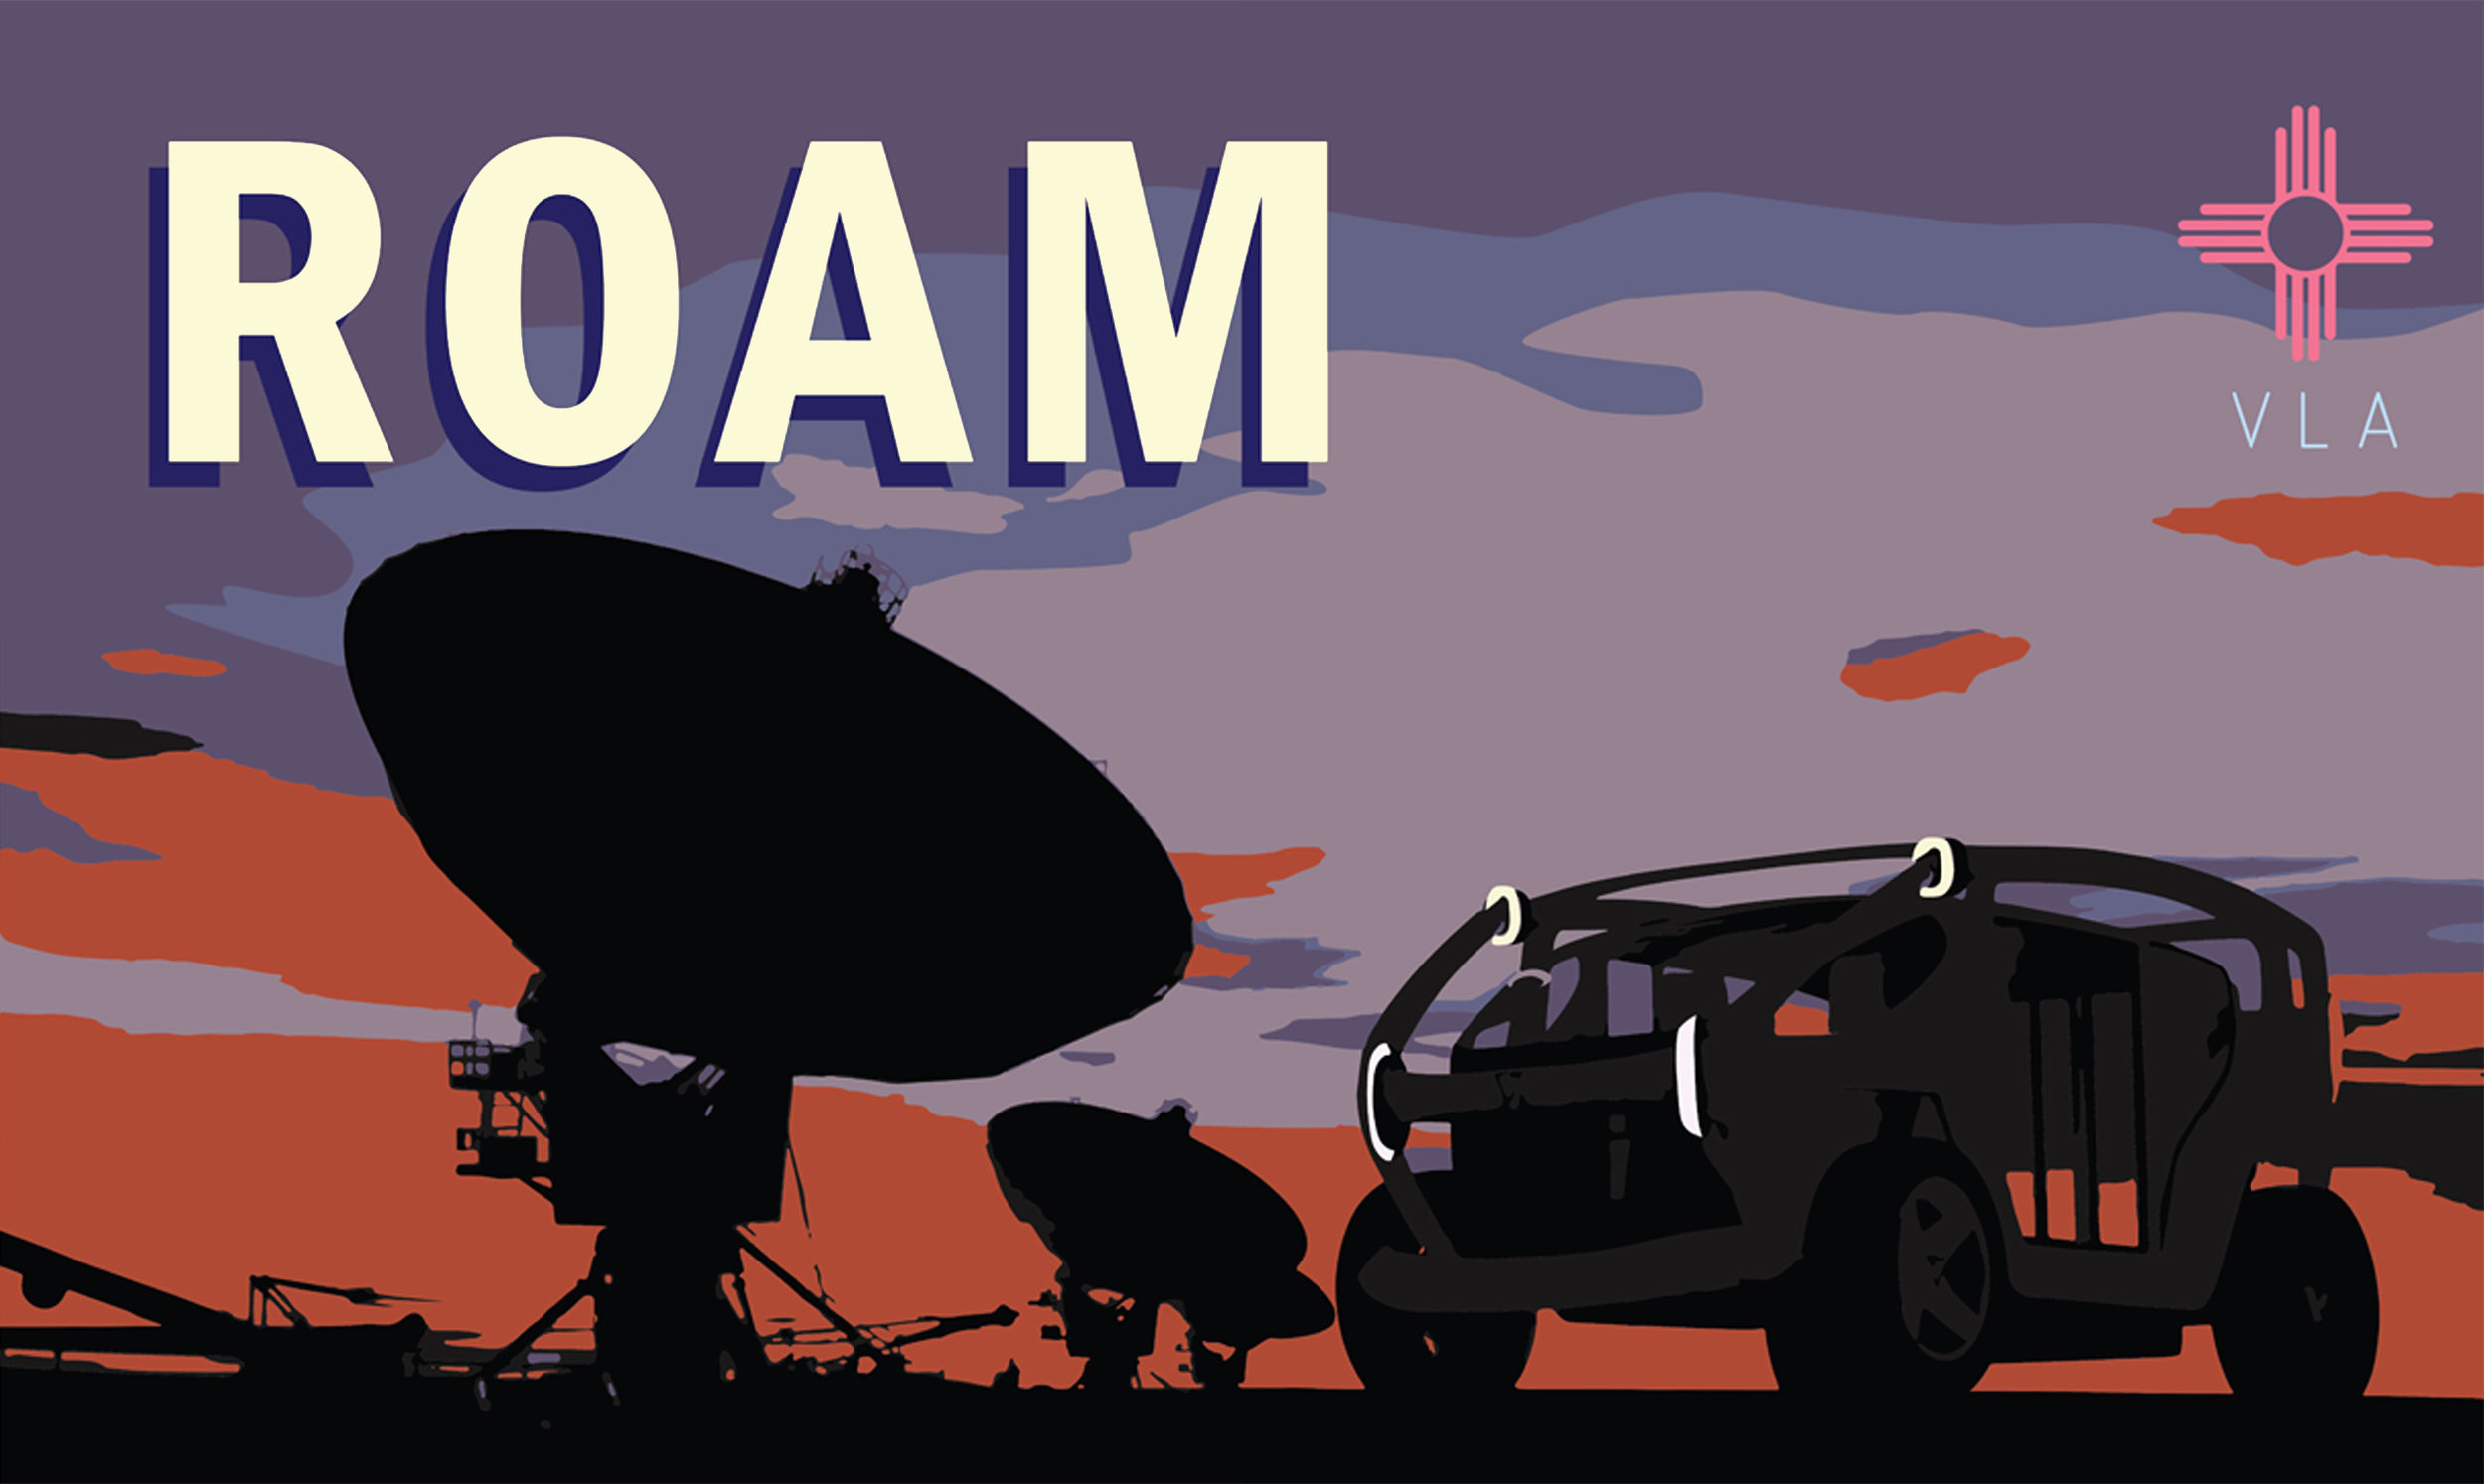 ROAM freely. Part of my ROAMR project.